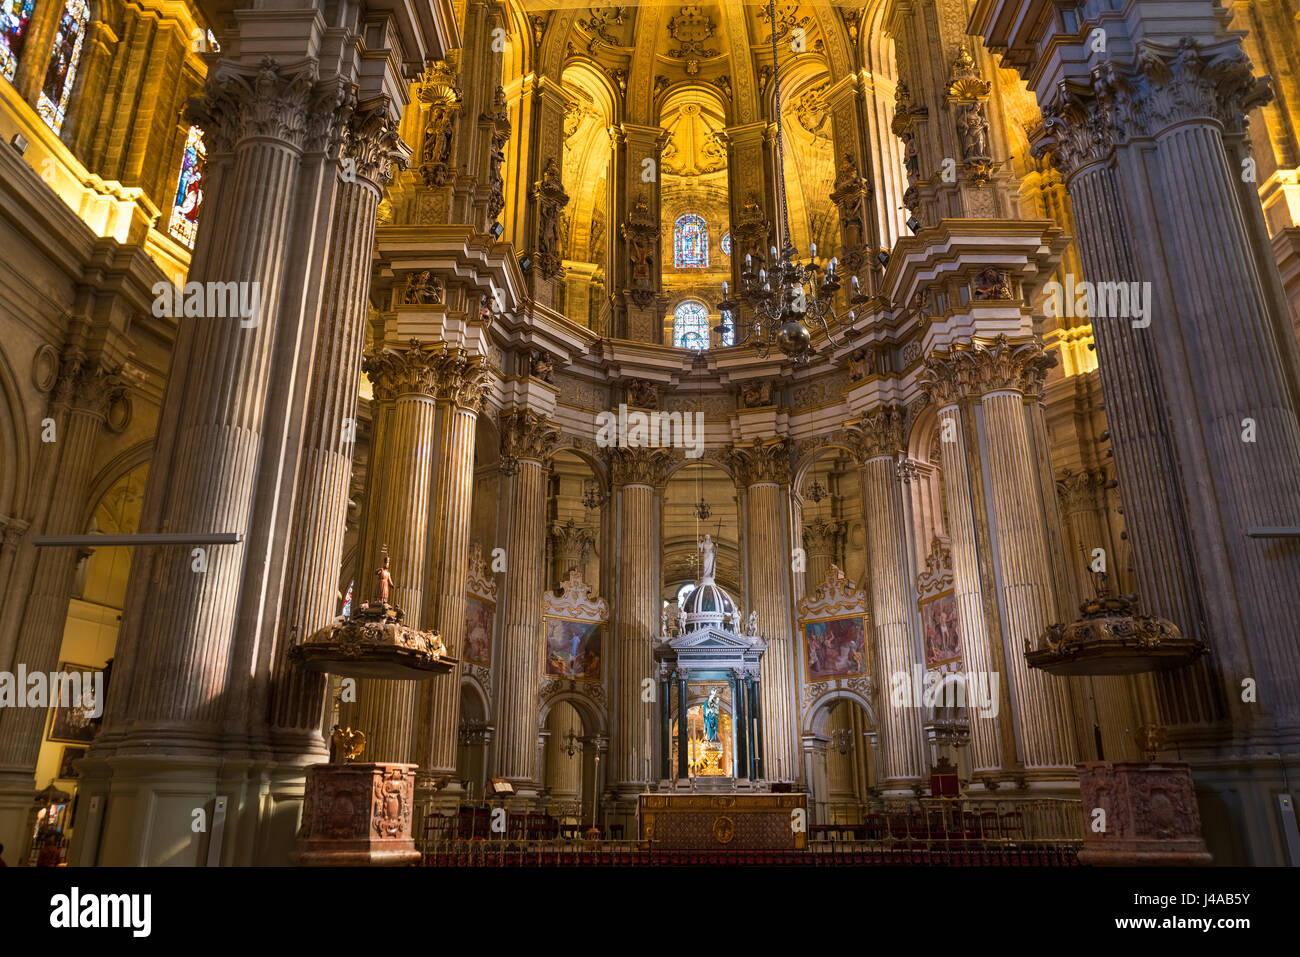 https://c7.alamy.com/comp/J4AB5Y/cathedral-interior-malaga-spain-la-santa-iglesia-catedral-basilica-J4AB5Y.jpg